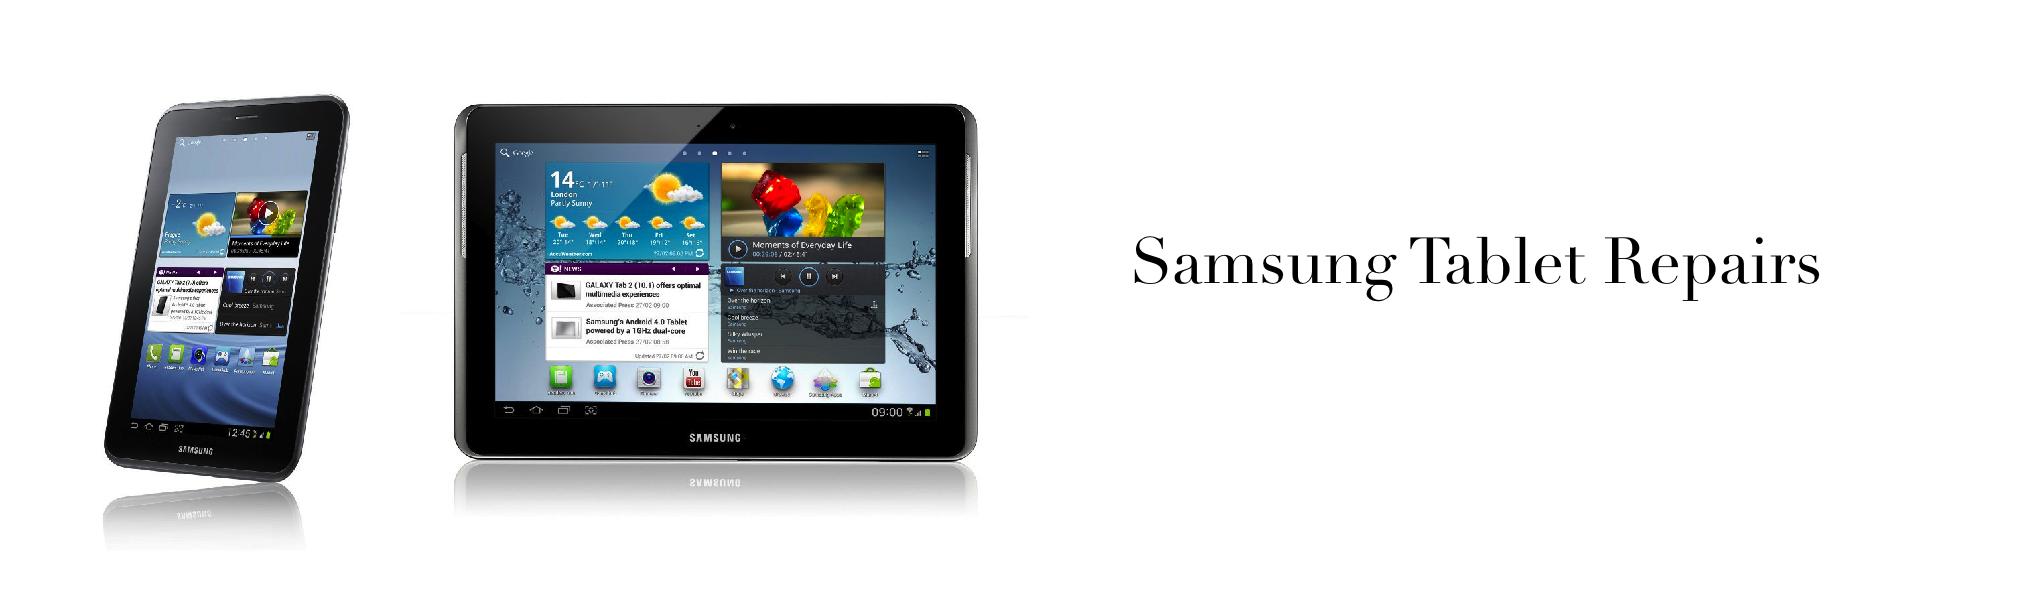 Samsung Galaxy Tab repairs.jpg